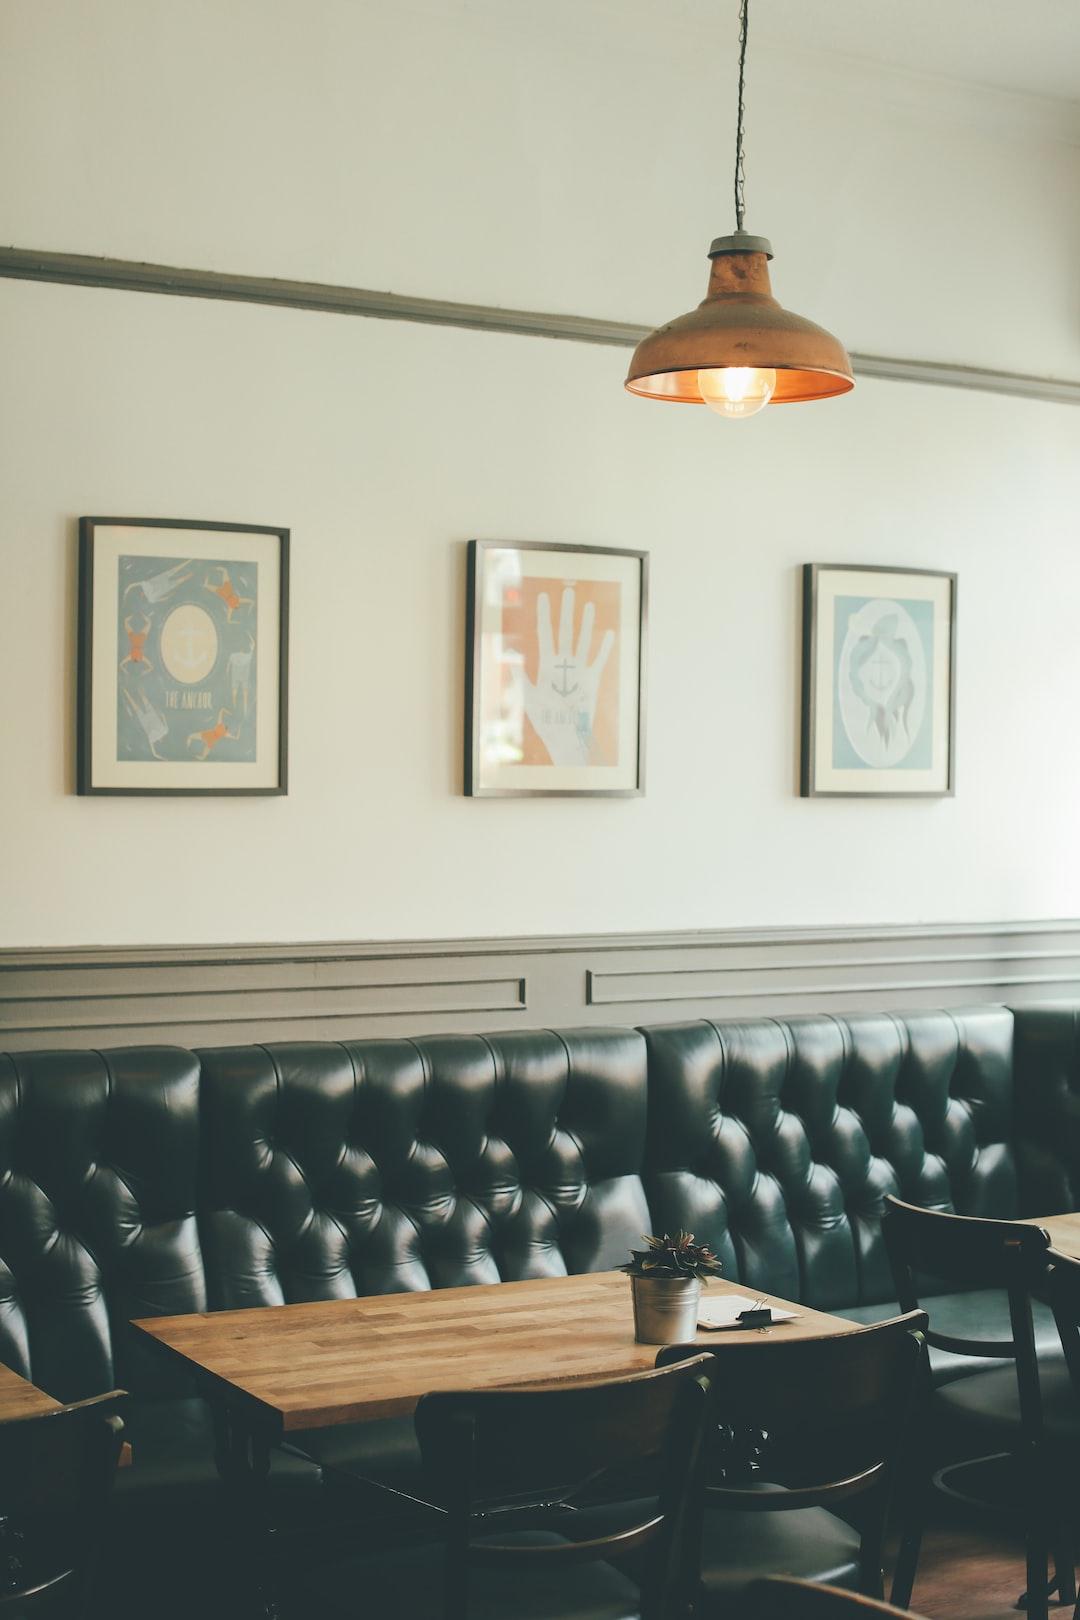 Leather sofa in a café